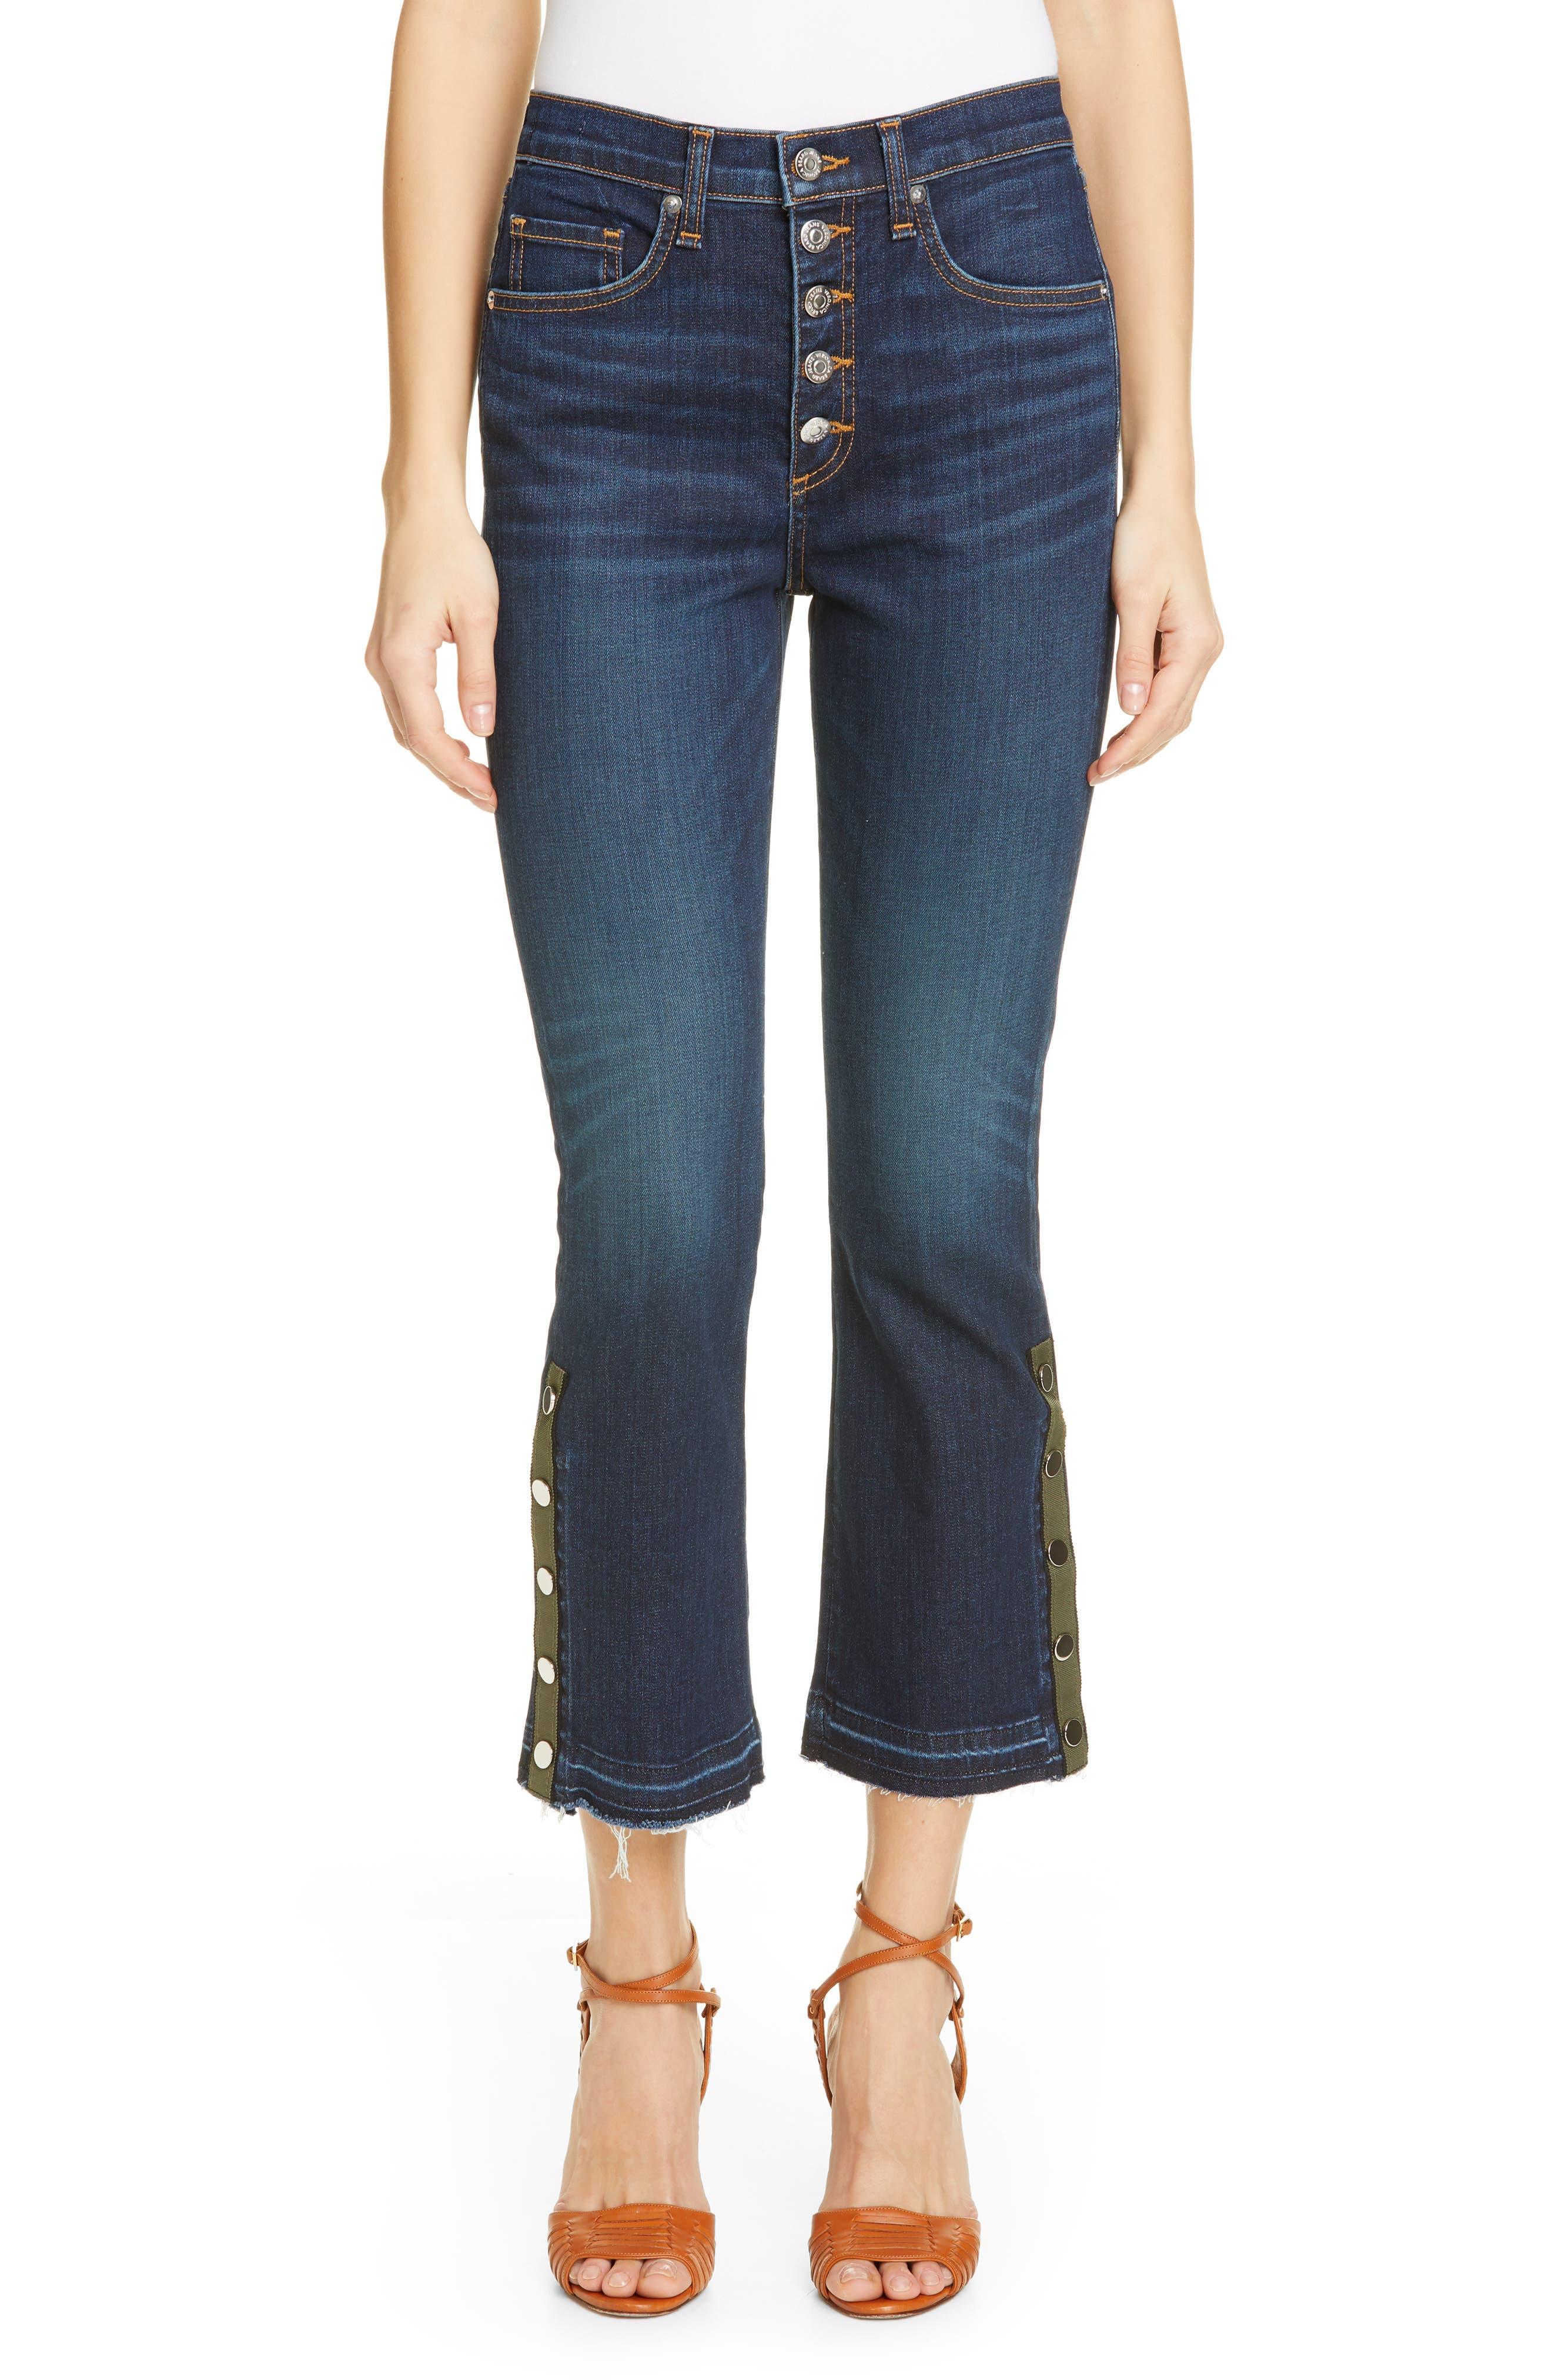 VERONICA BEARD, Carolyn Side Vent Baby Boot Jeans, Main thumbnail 1, color, DARK VINTAGE